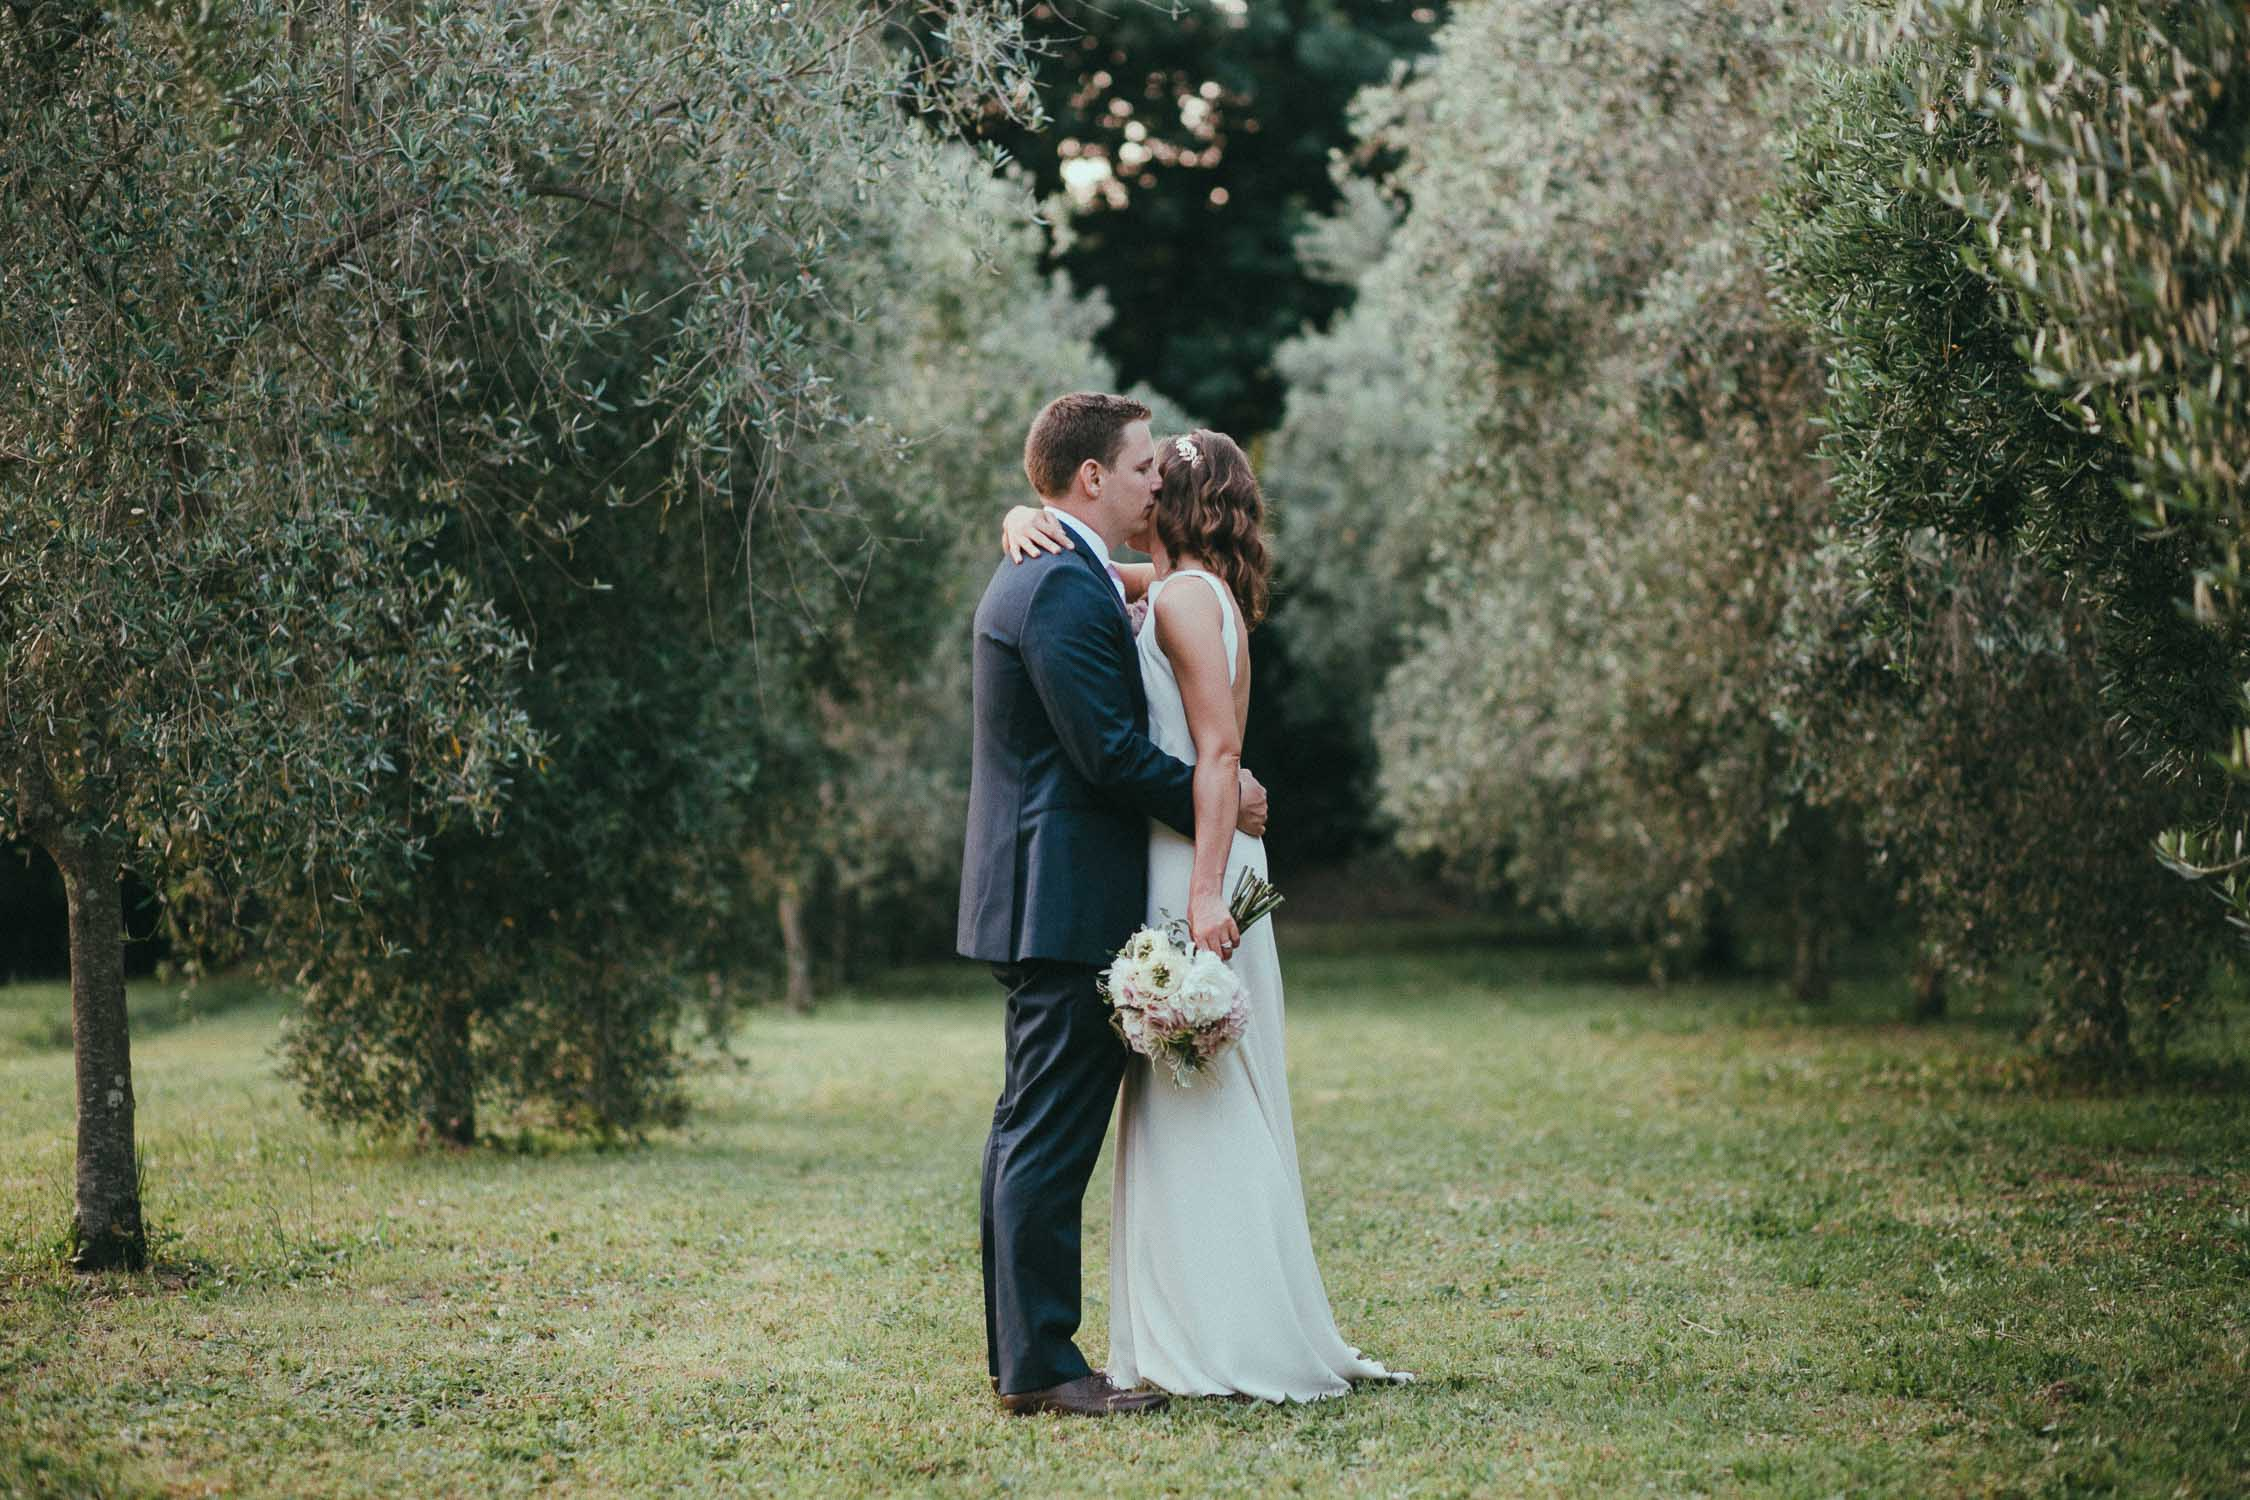 couple-portraits-destination-wedding (9).jpg